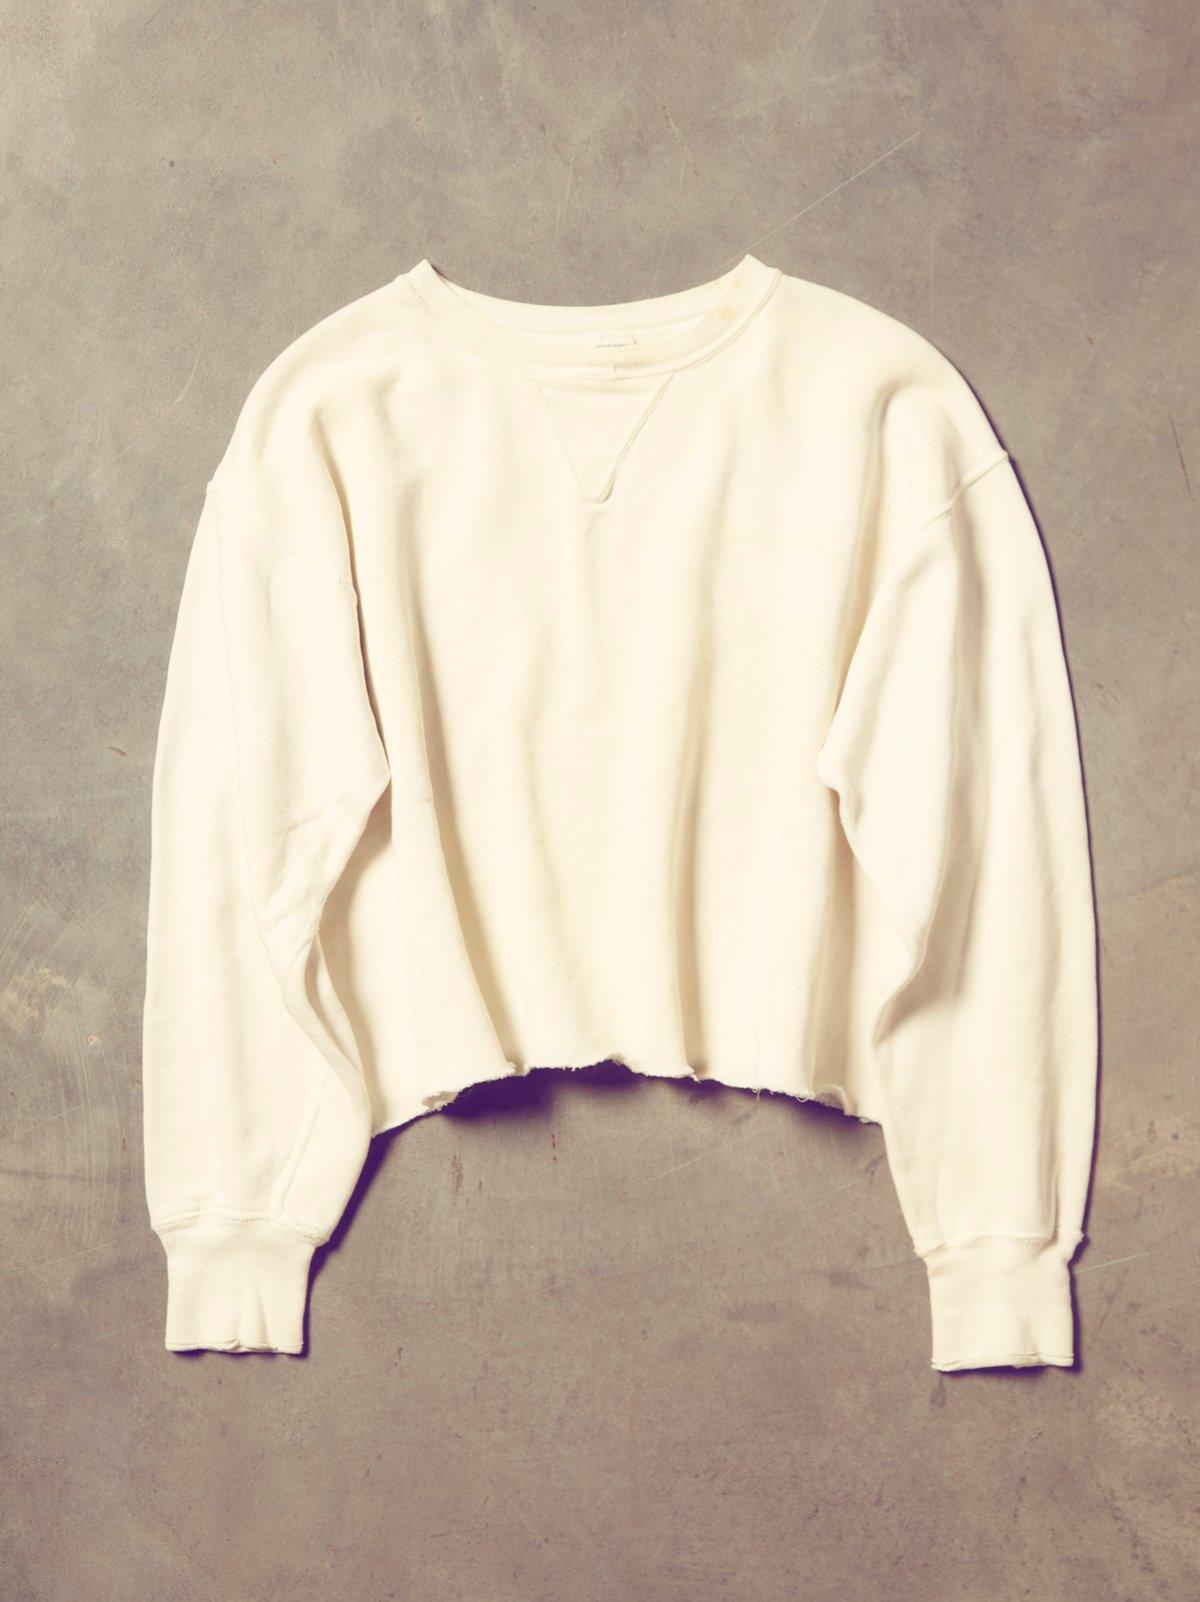 Vintage 1960s V-Neck Sweatshirt